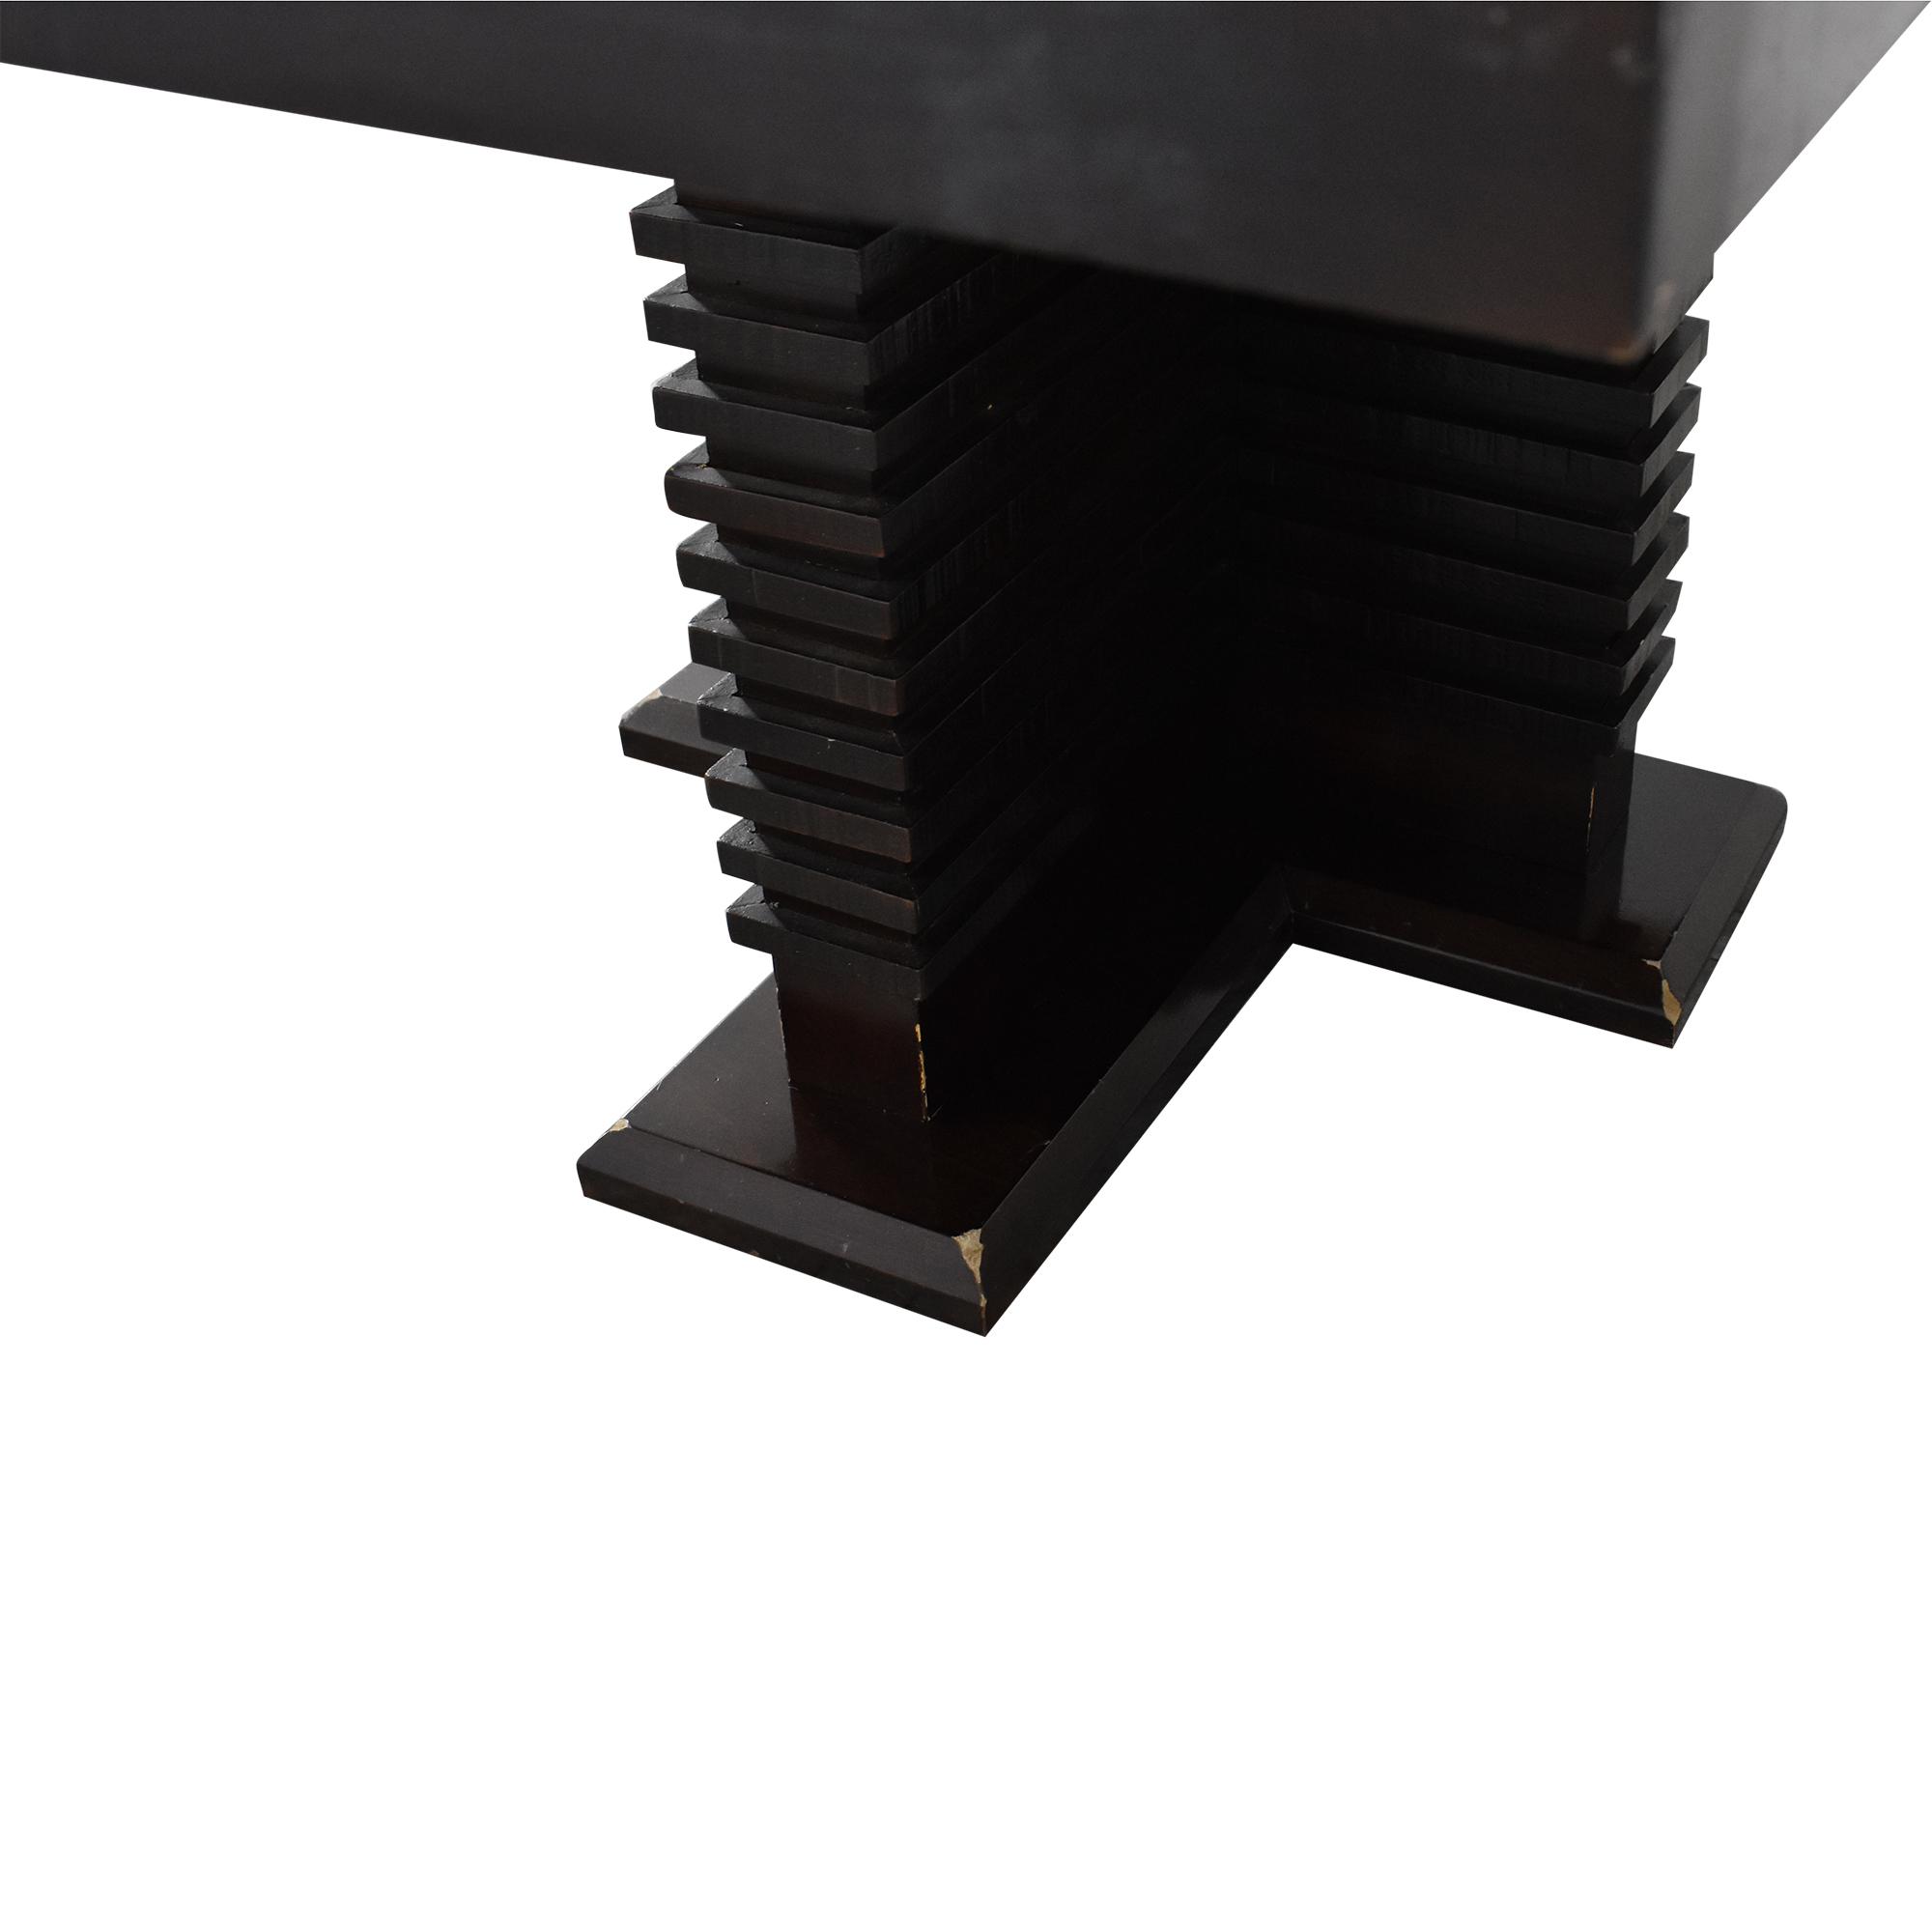 Legacy Classic Furniture Legacy Classic Furniture Rectangular Pedestal Table for sale